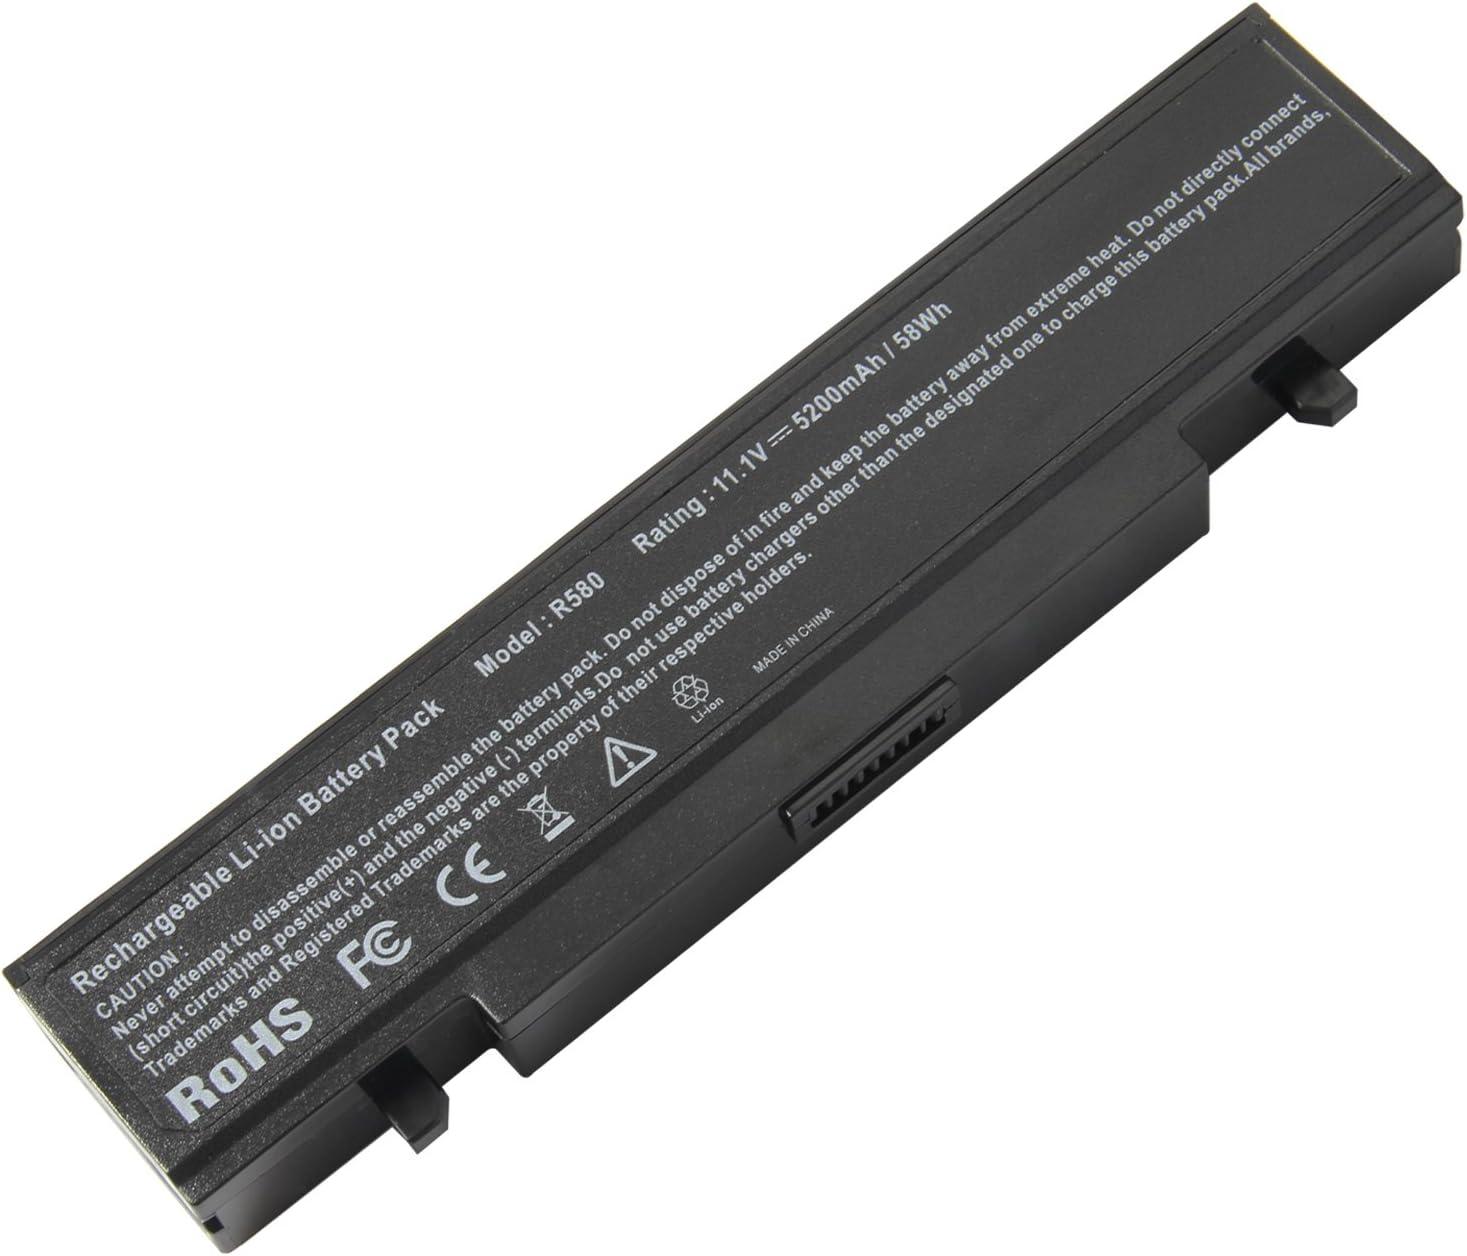 ARyee Battery Laptop for Samsung AA-PB9MC6B AA-PB9NC6B AA-PB9NC6W AA-PB9NS6B R420 R430 R468 R470 R480 RV510 RV511 RC512 R519 R520 R530 R540 R580 R730 Q320 Q430 Np550P5c Np365e5c